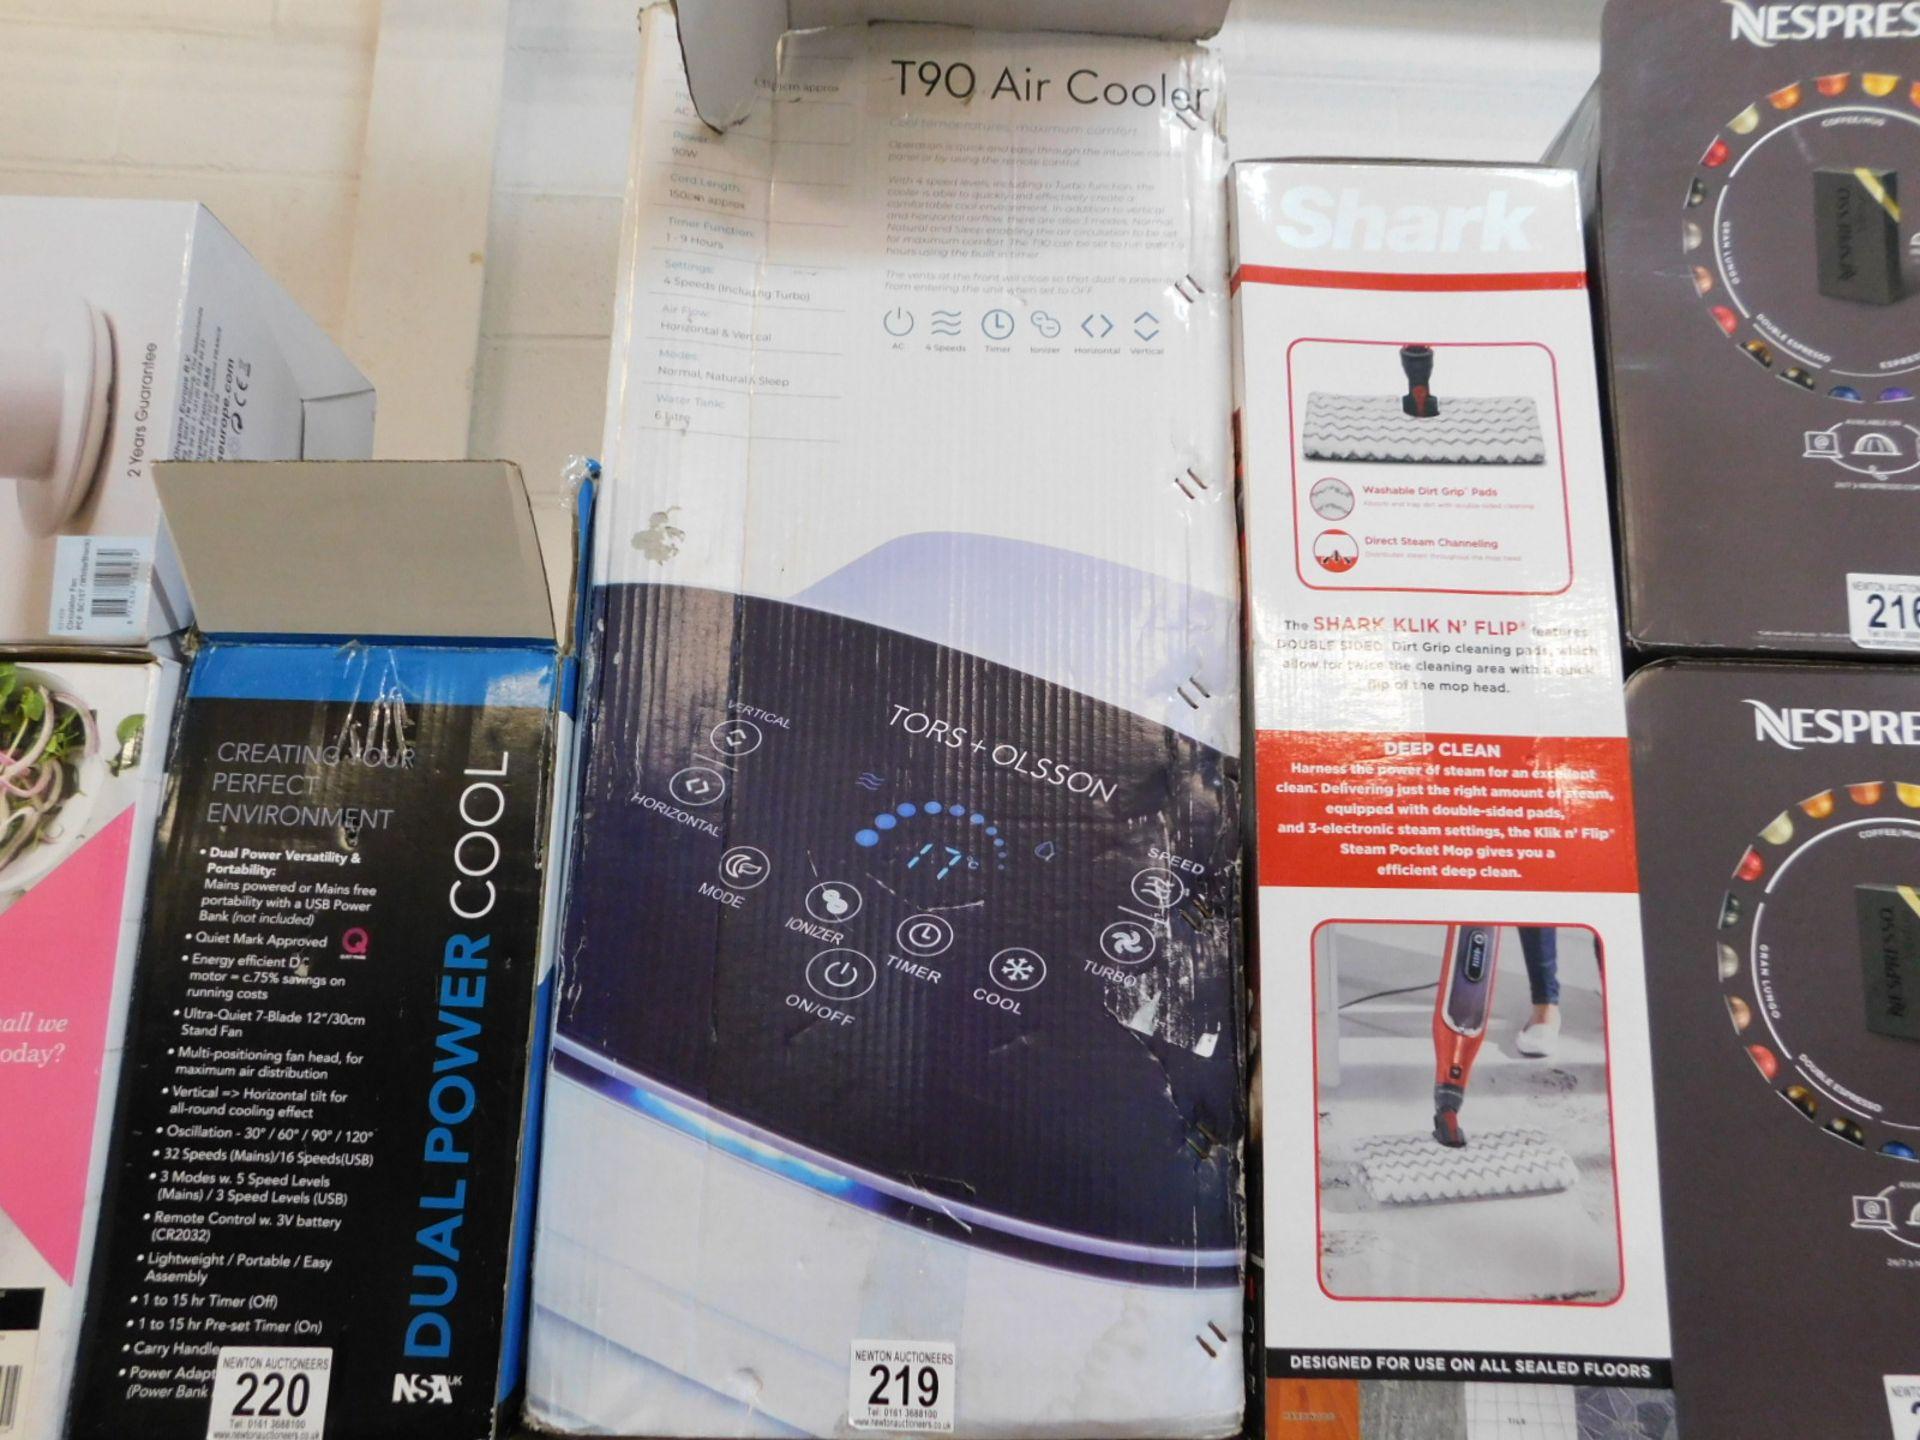 1 BOXED TORS + OLSSON T90 AIR COOLER RRP £149.99